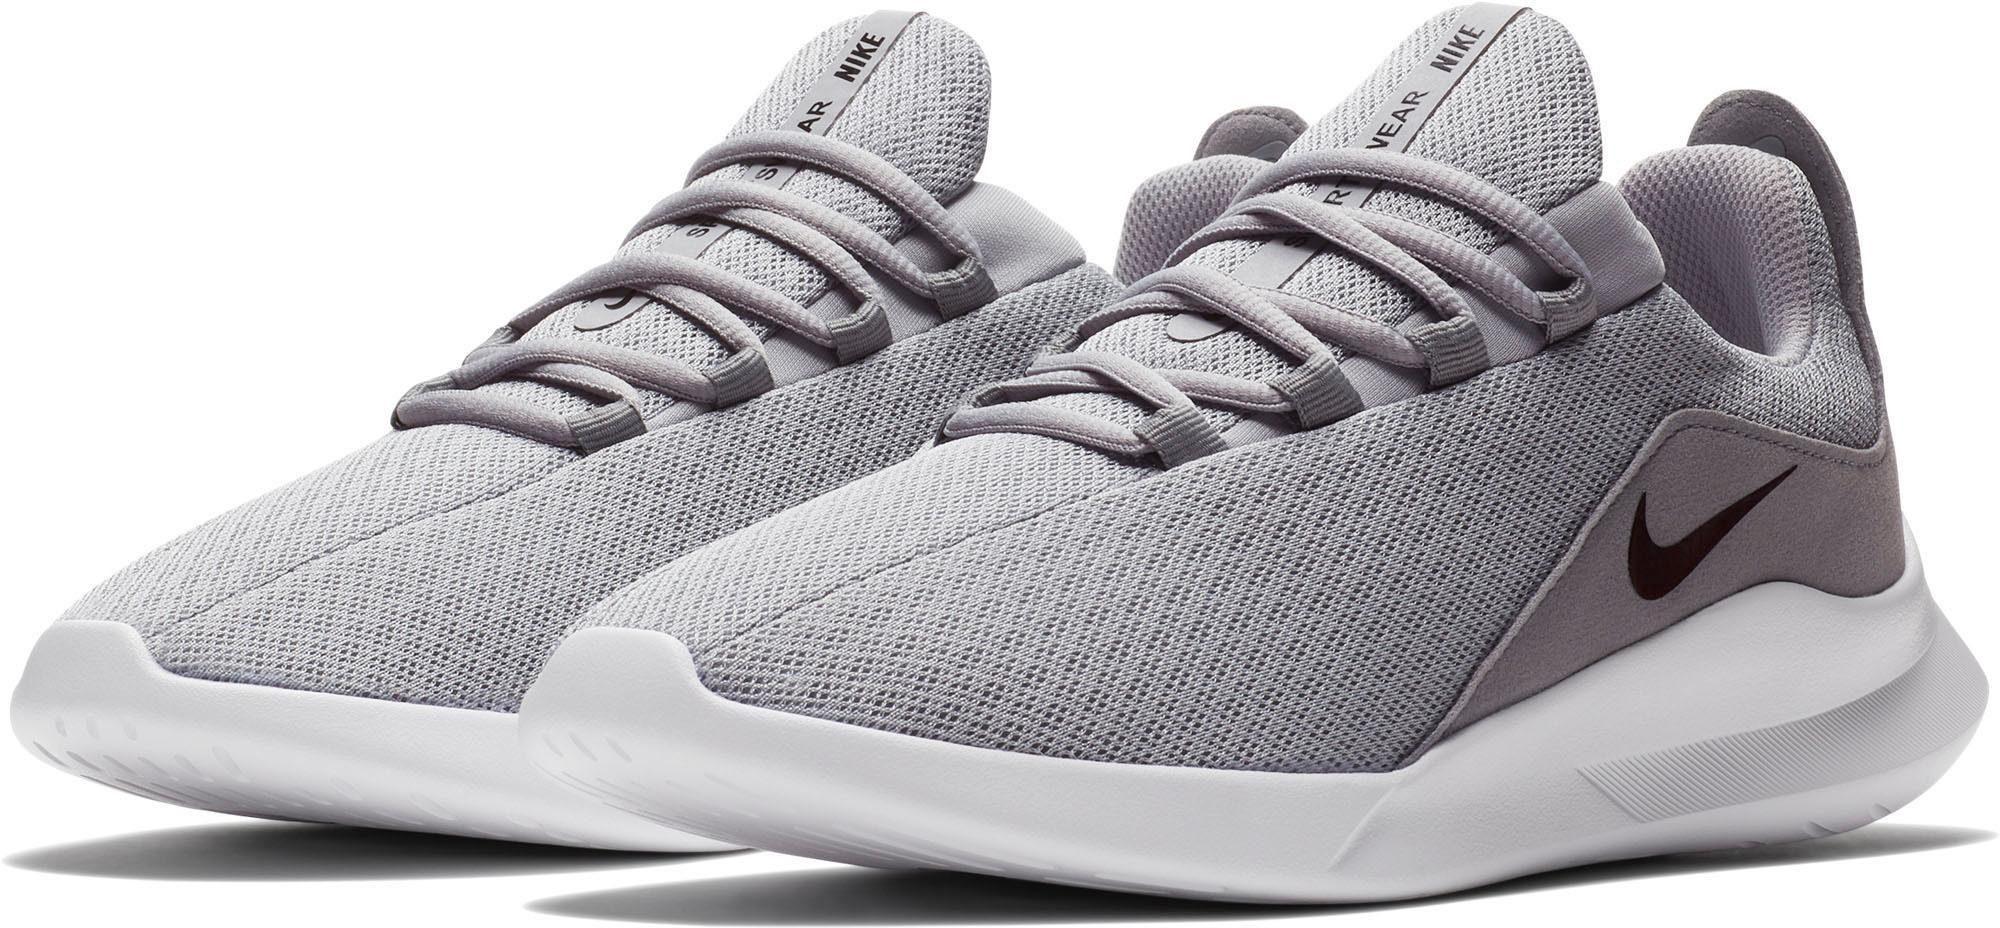 Sportswear »viale« Aus Und KaufenOtto Synthetik Textil Nike SneakerObermaterialmix Online rtxQdshC